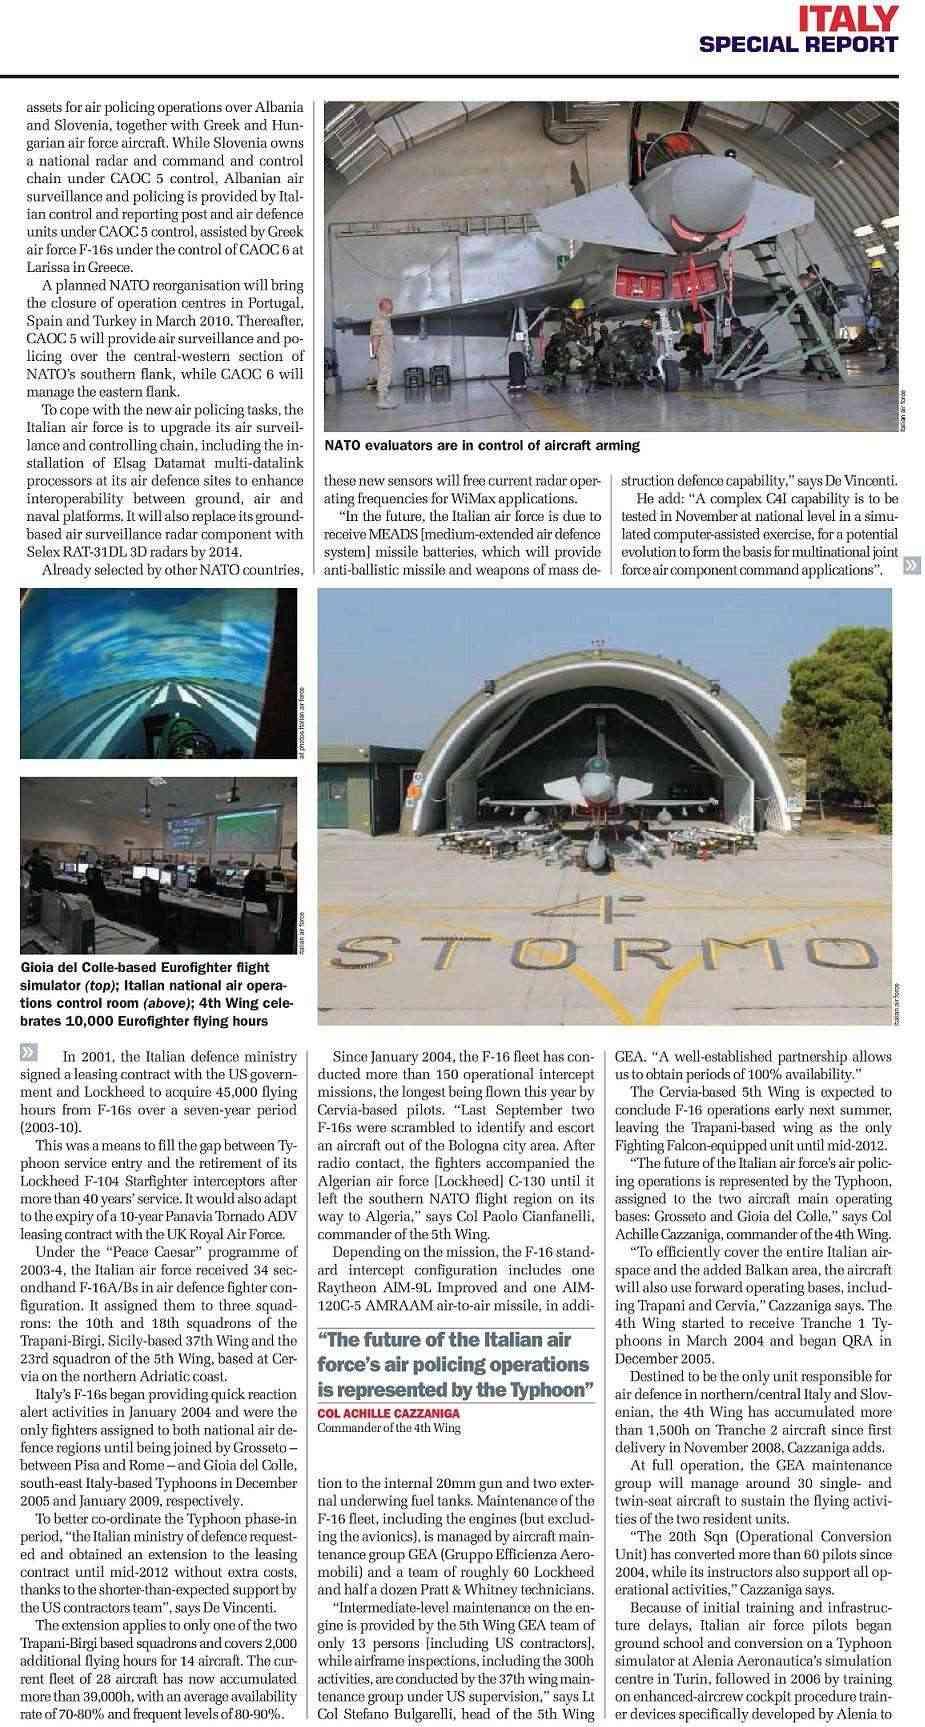 Armée Italienne/Forze Armate Italiane - Page 2 Italyq11